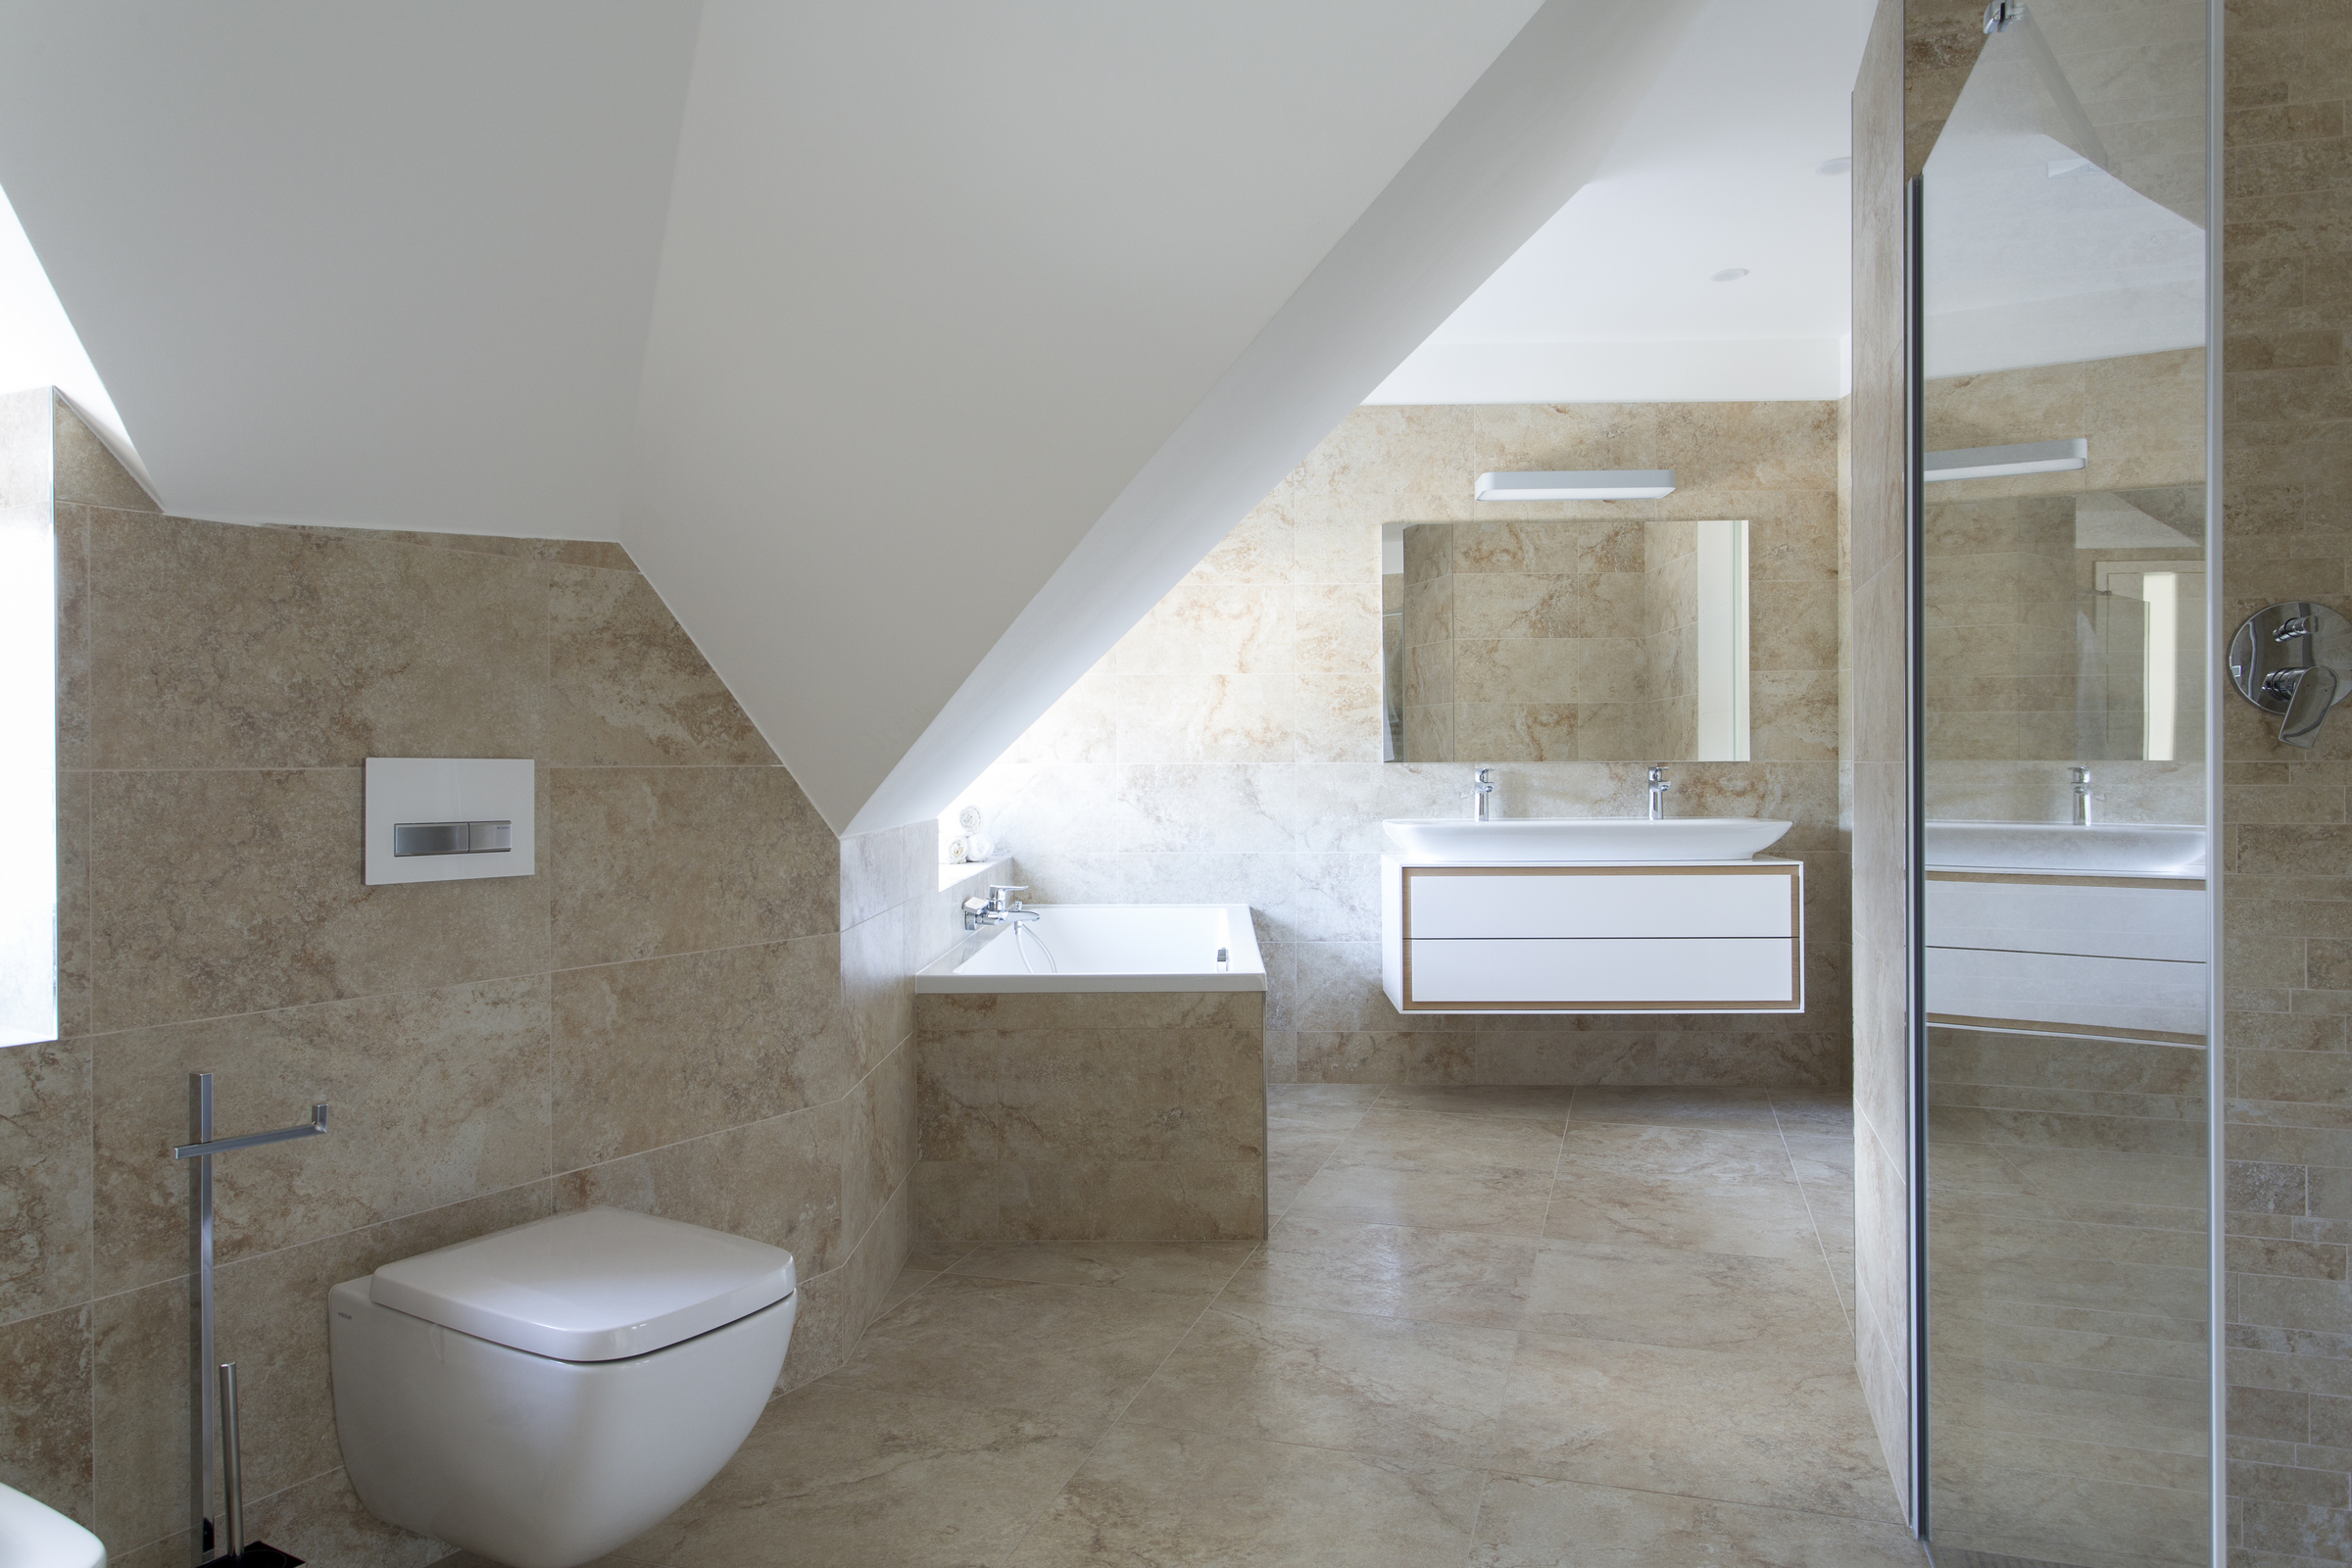 aleluia-Duomo-obklady-dlazba-do-koupelny-vzhledu-kamene